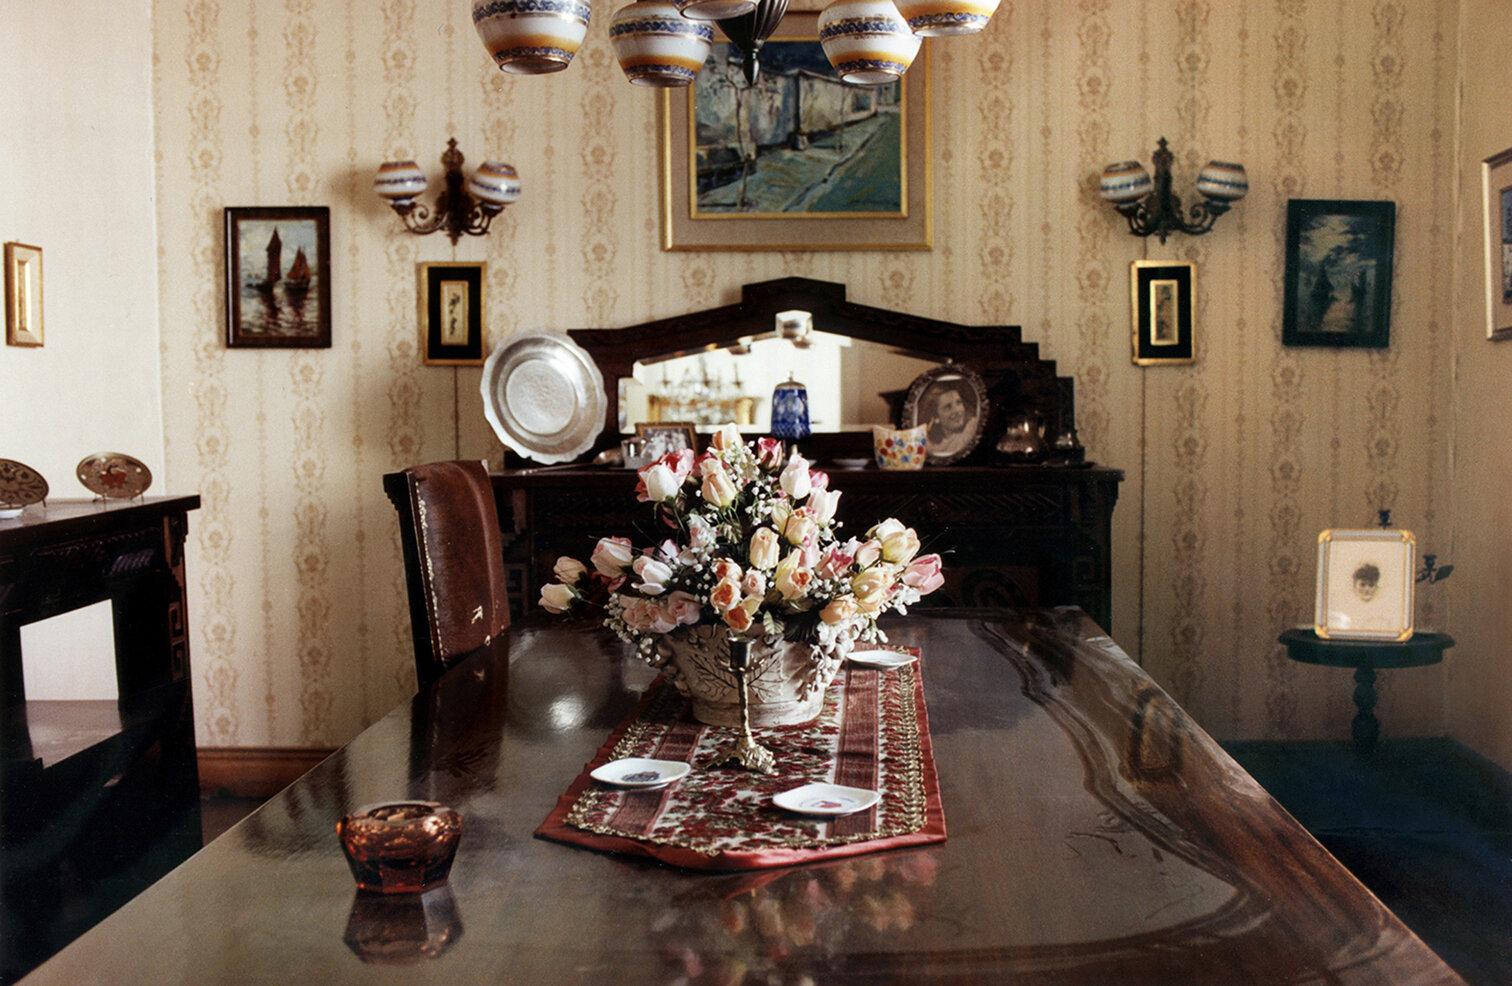 18 Comedor Lasteche Lasteche´s dining room 2000.jpg